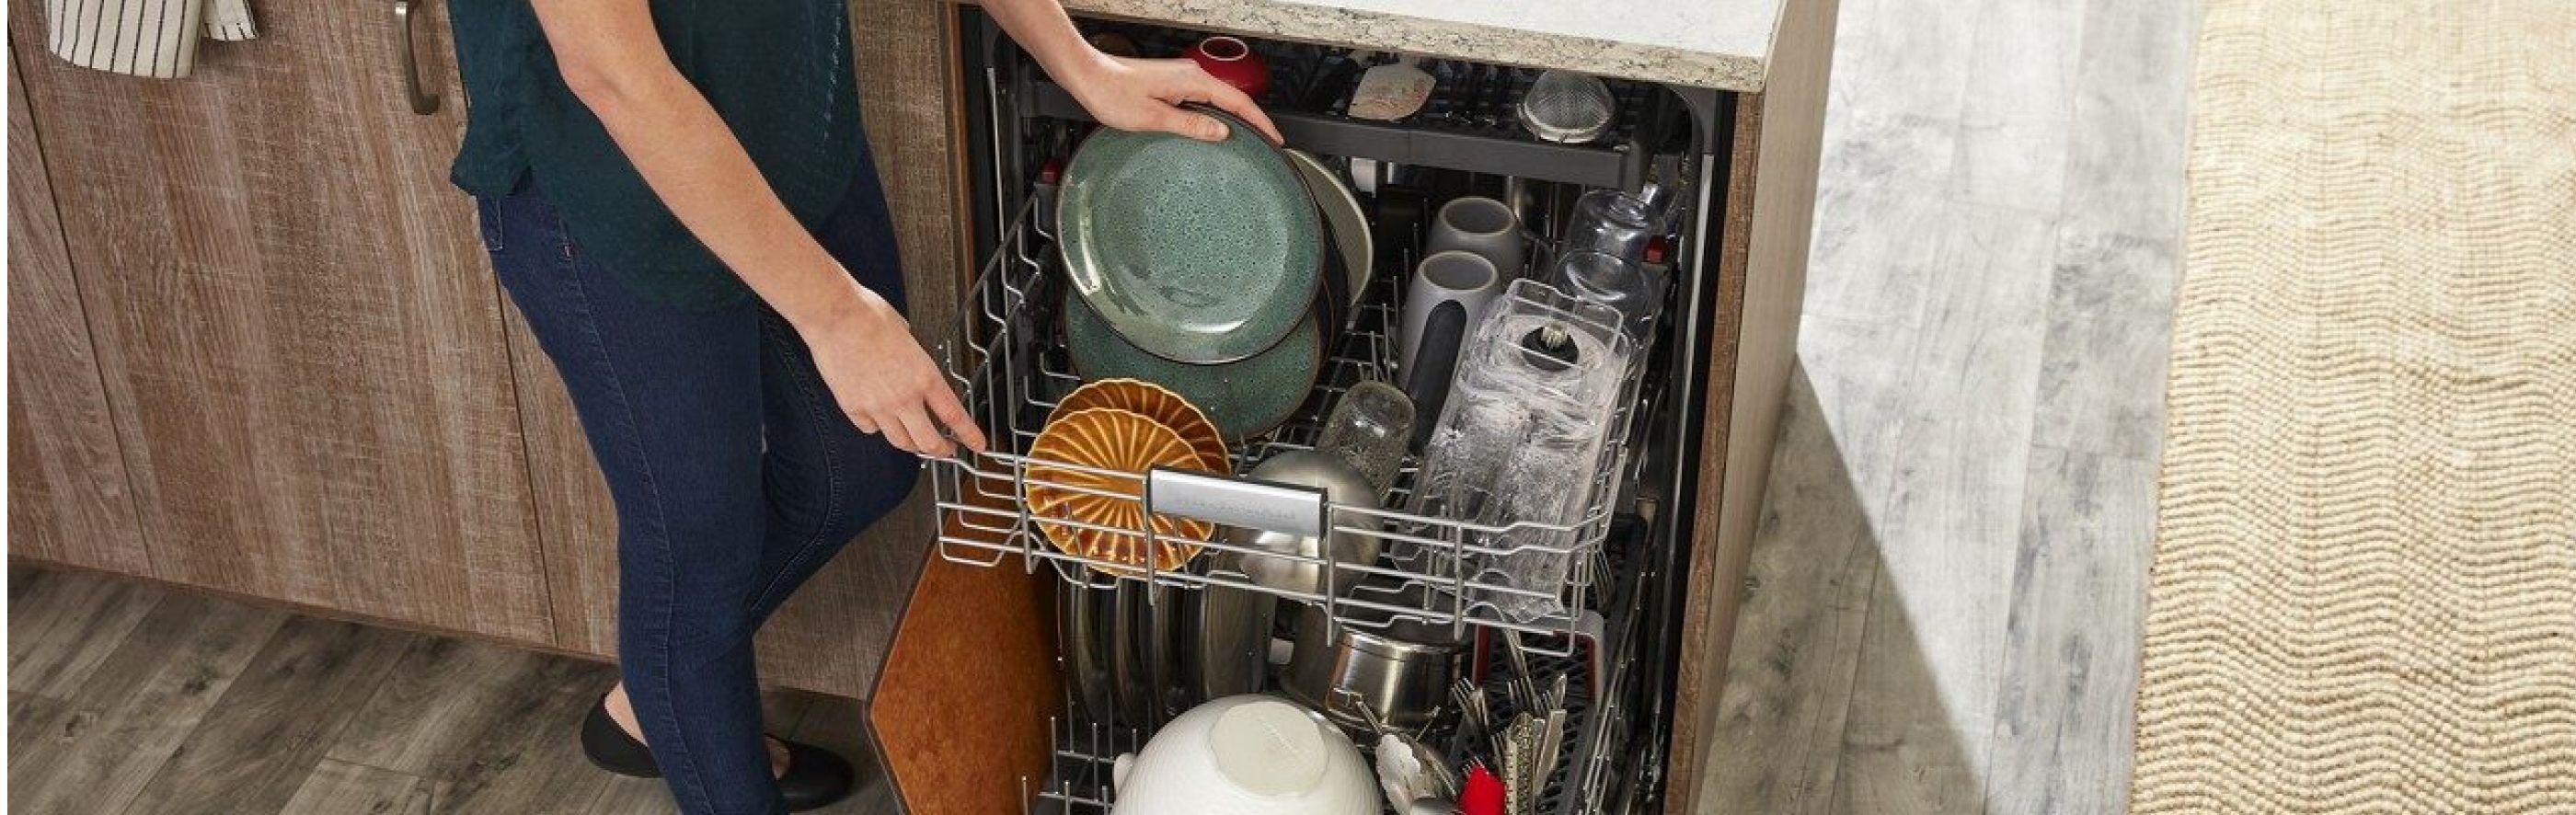 Woman loading dishes into dishwasher